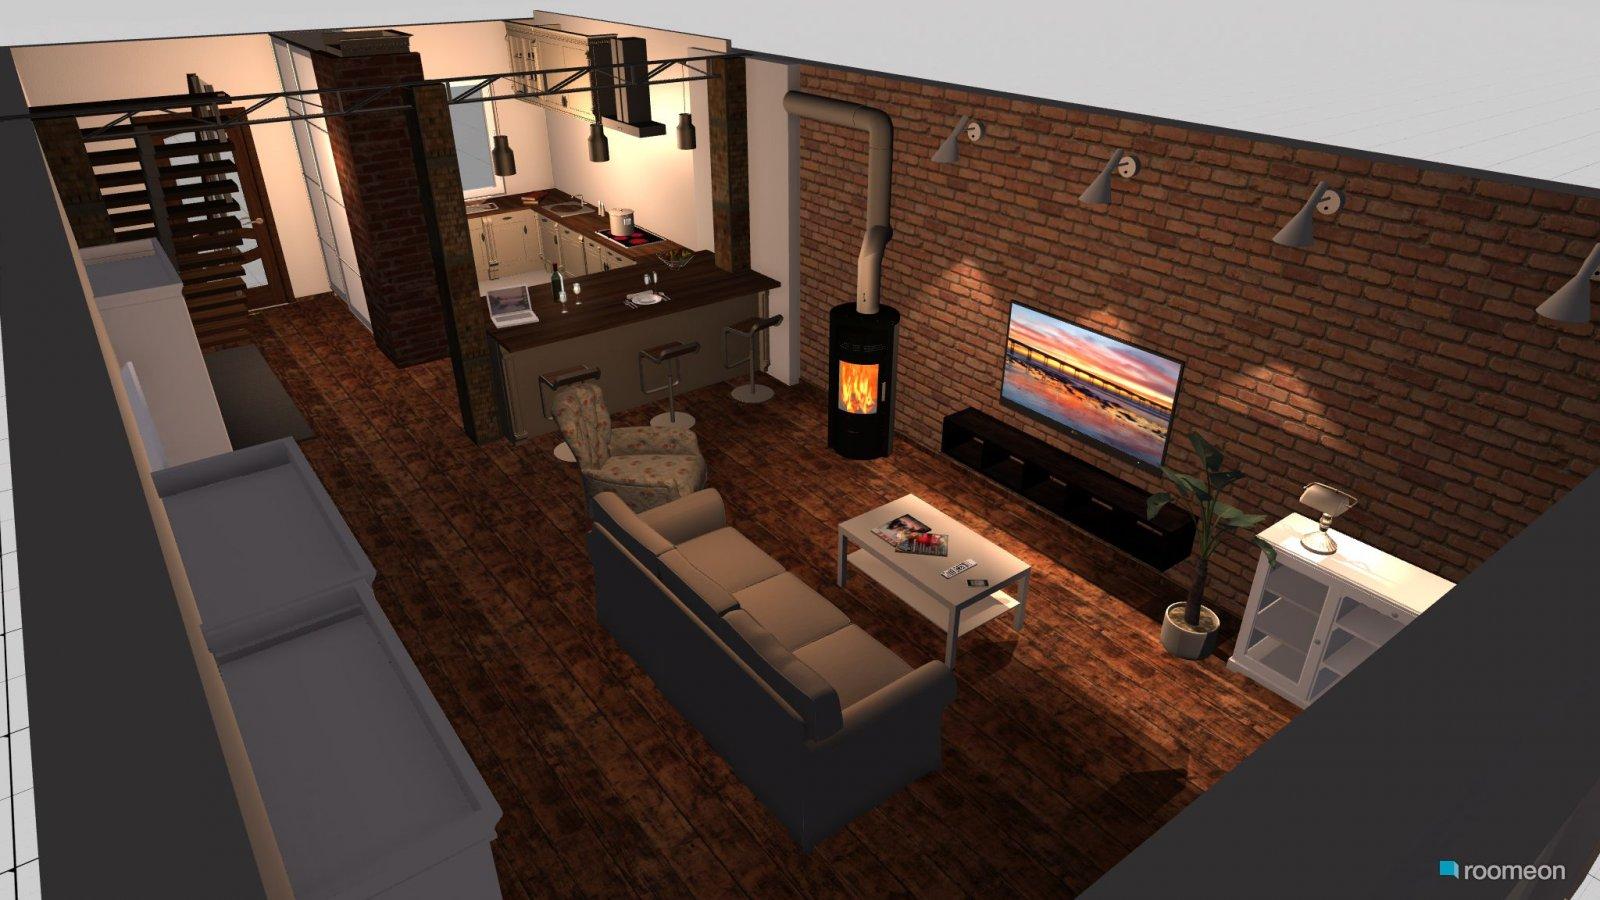 raumplanung wohnzimmer mit st tze roomeon community. Black Bedroom Furniture Sets. Home Design Ideas